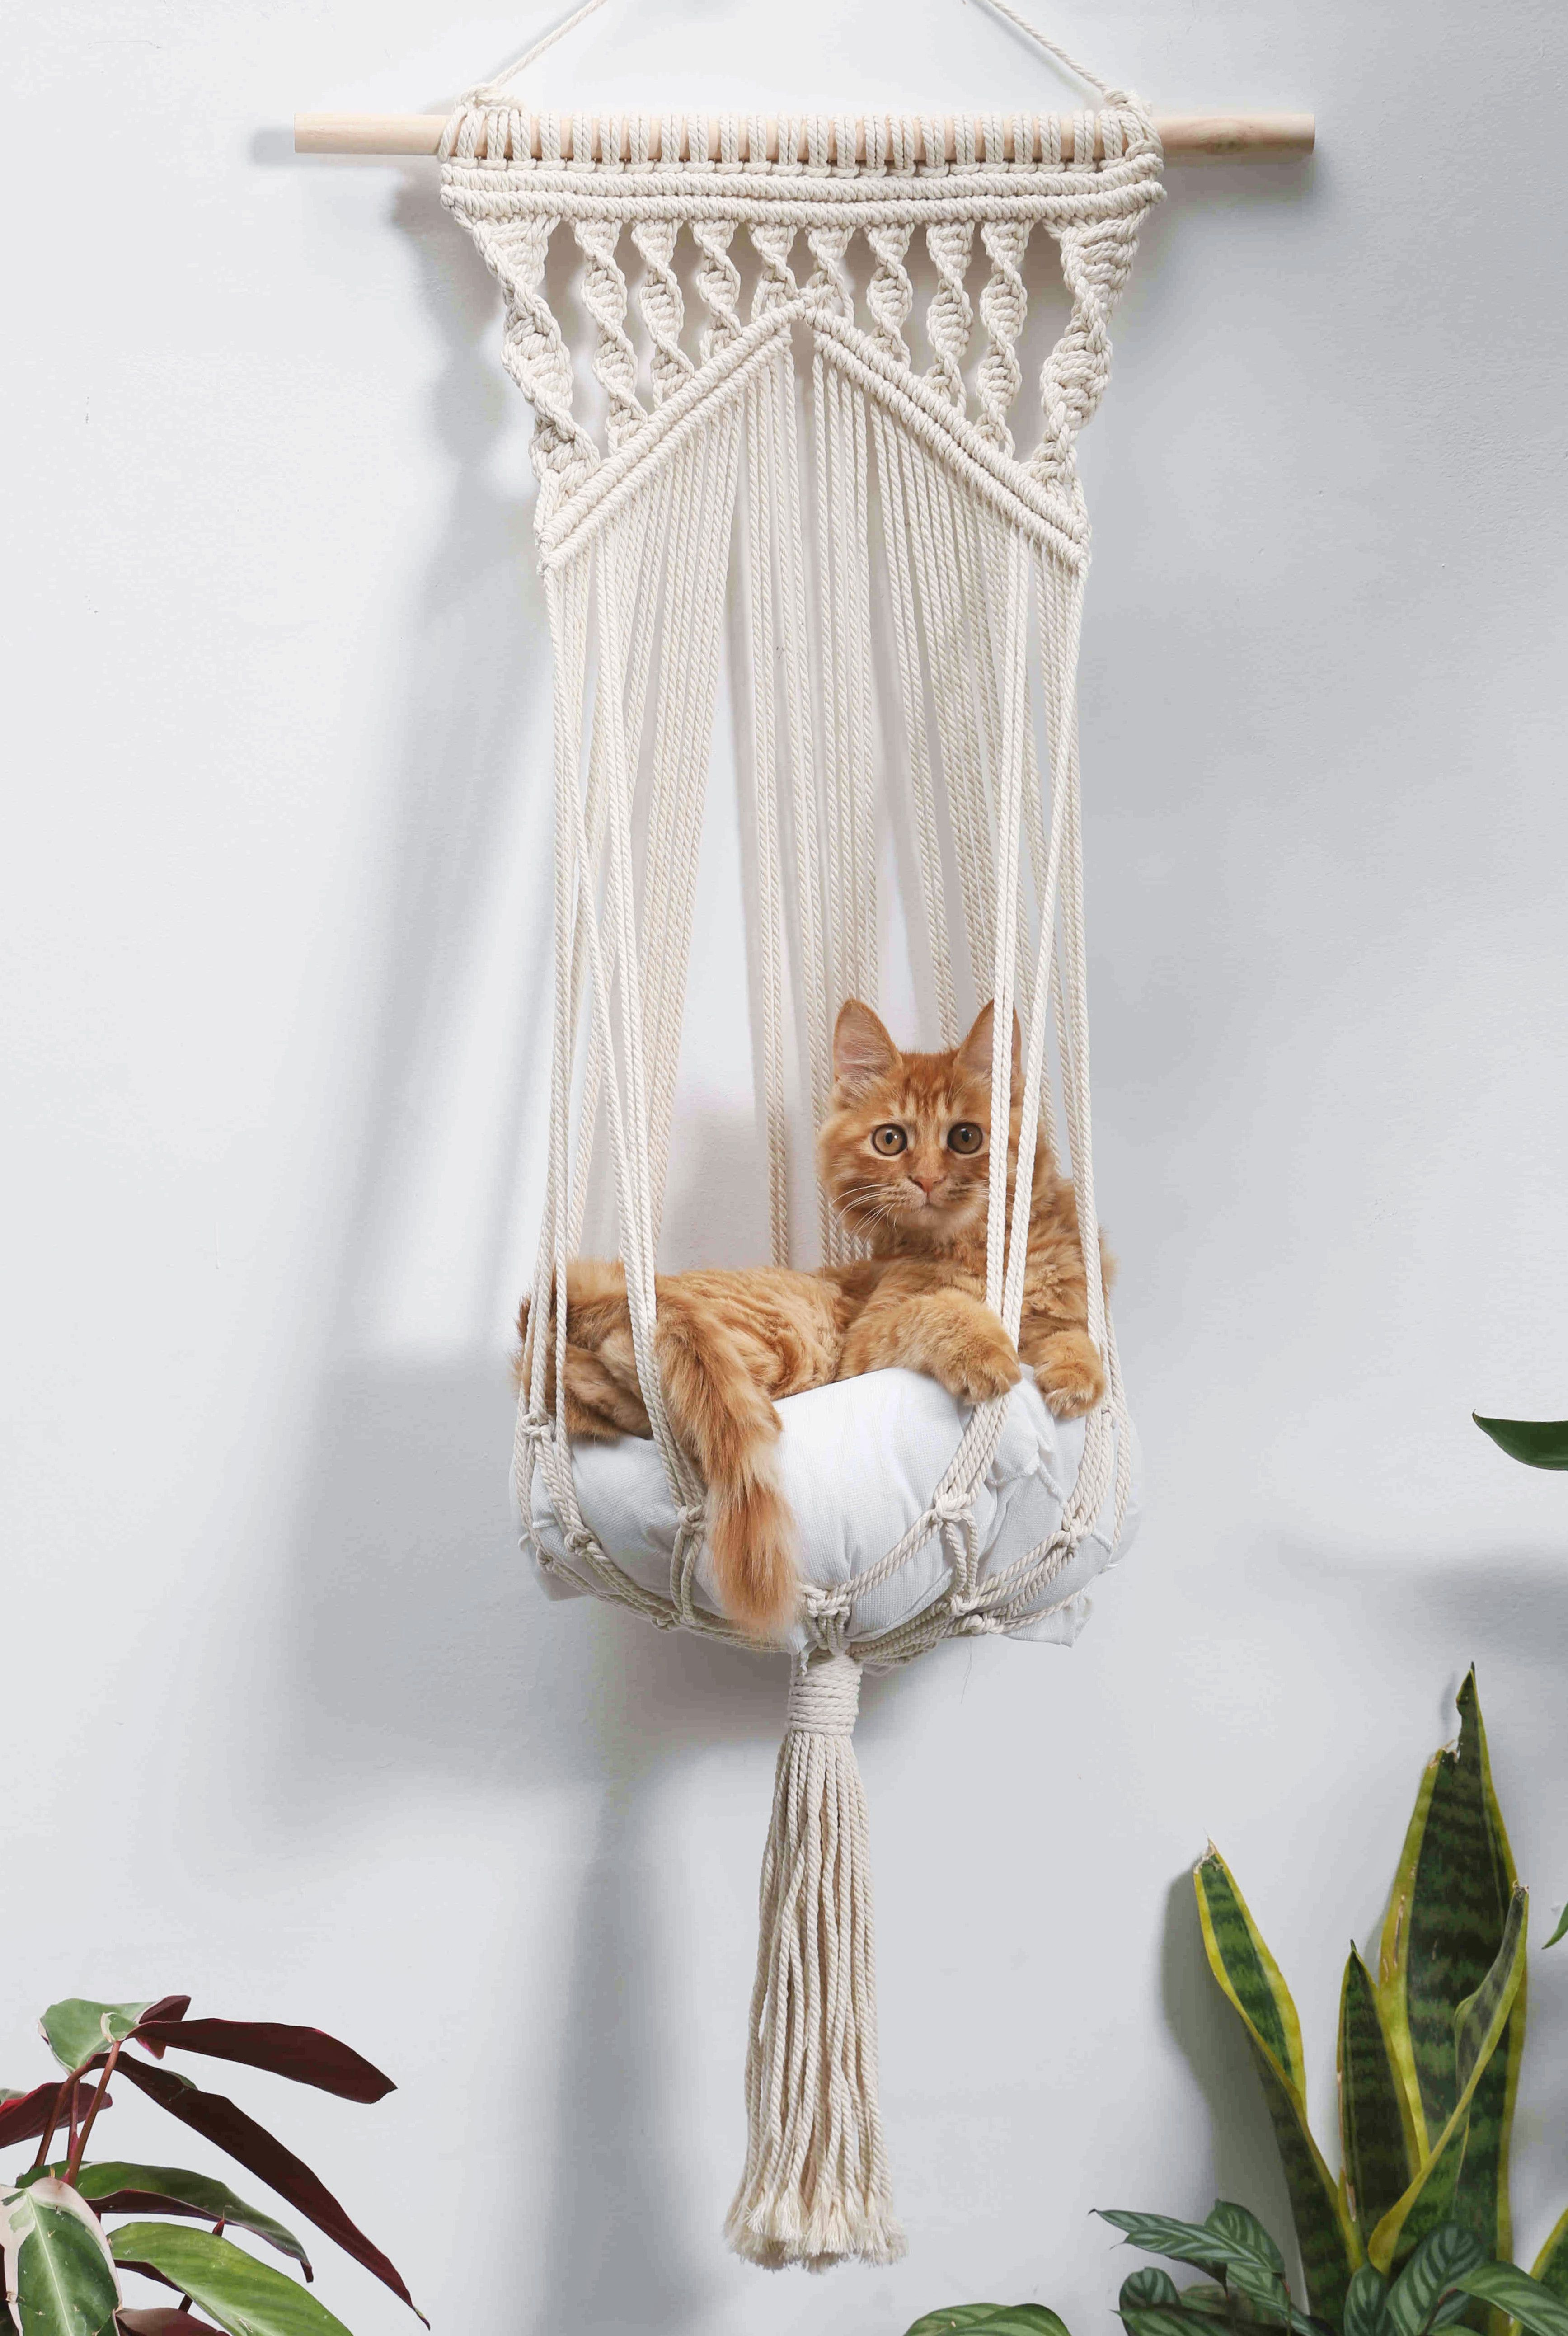 Macrame Cat Hammock Woven Wall Hanging Dog Bed Dip Dye Macrame Etsy In 2020 Woven Wall Hanging Diy Stuffed Animals Cat Hammock